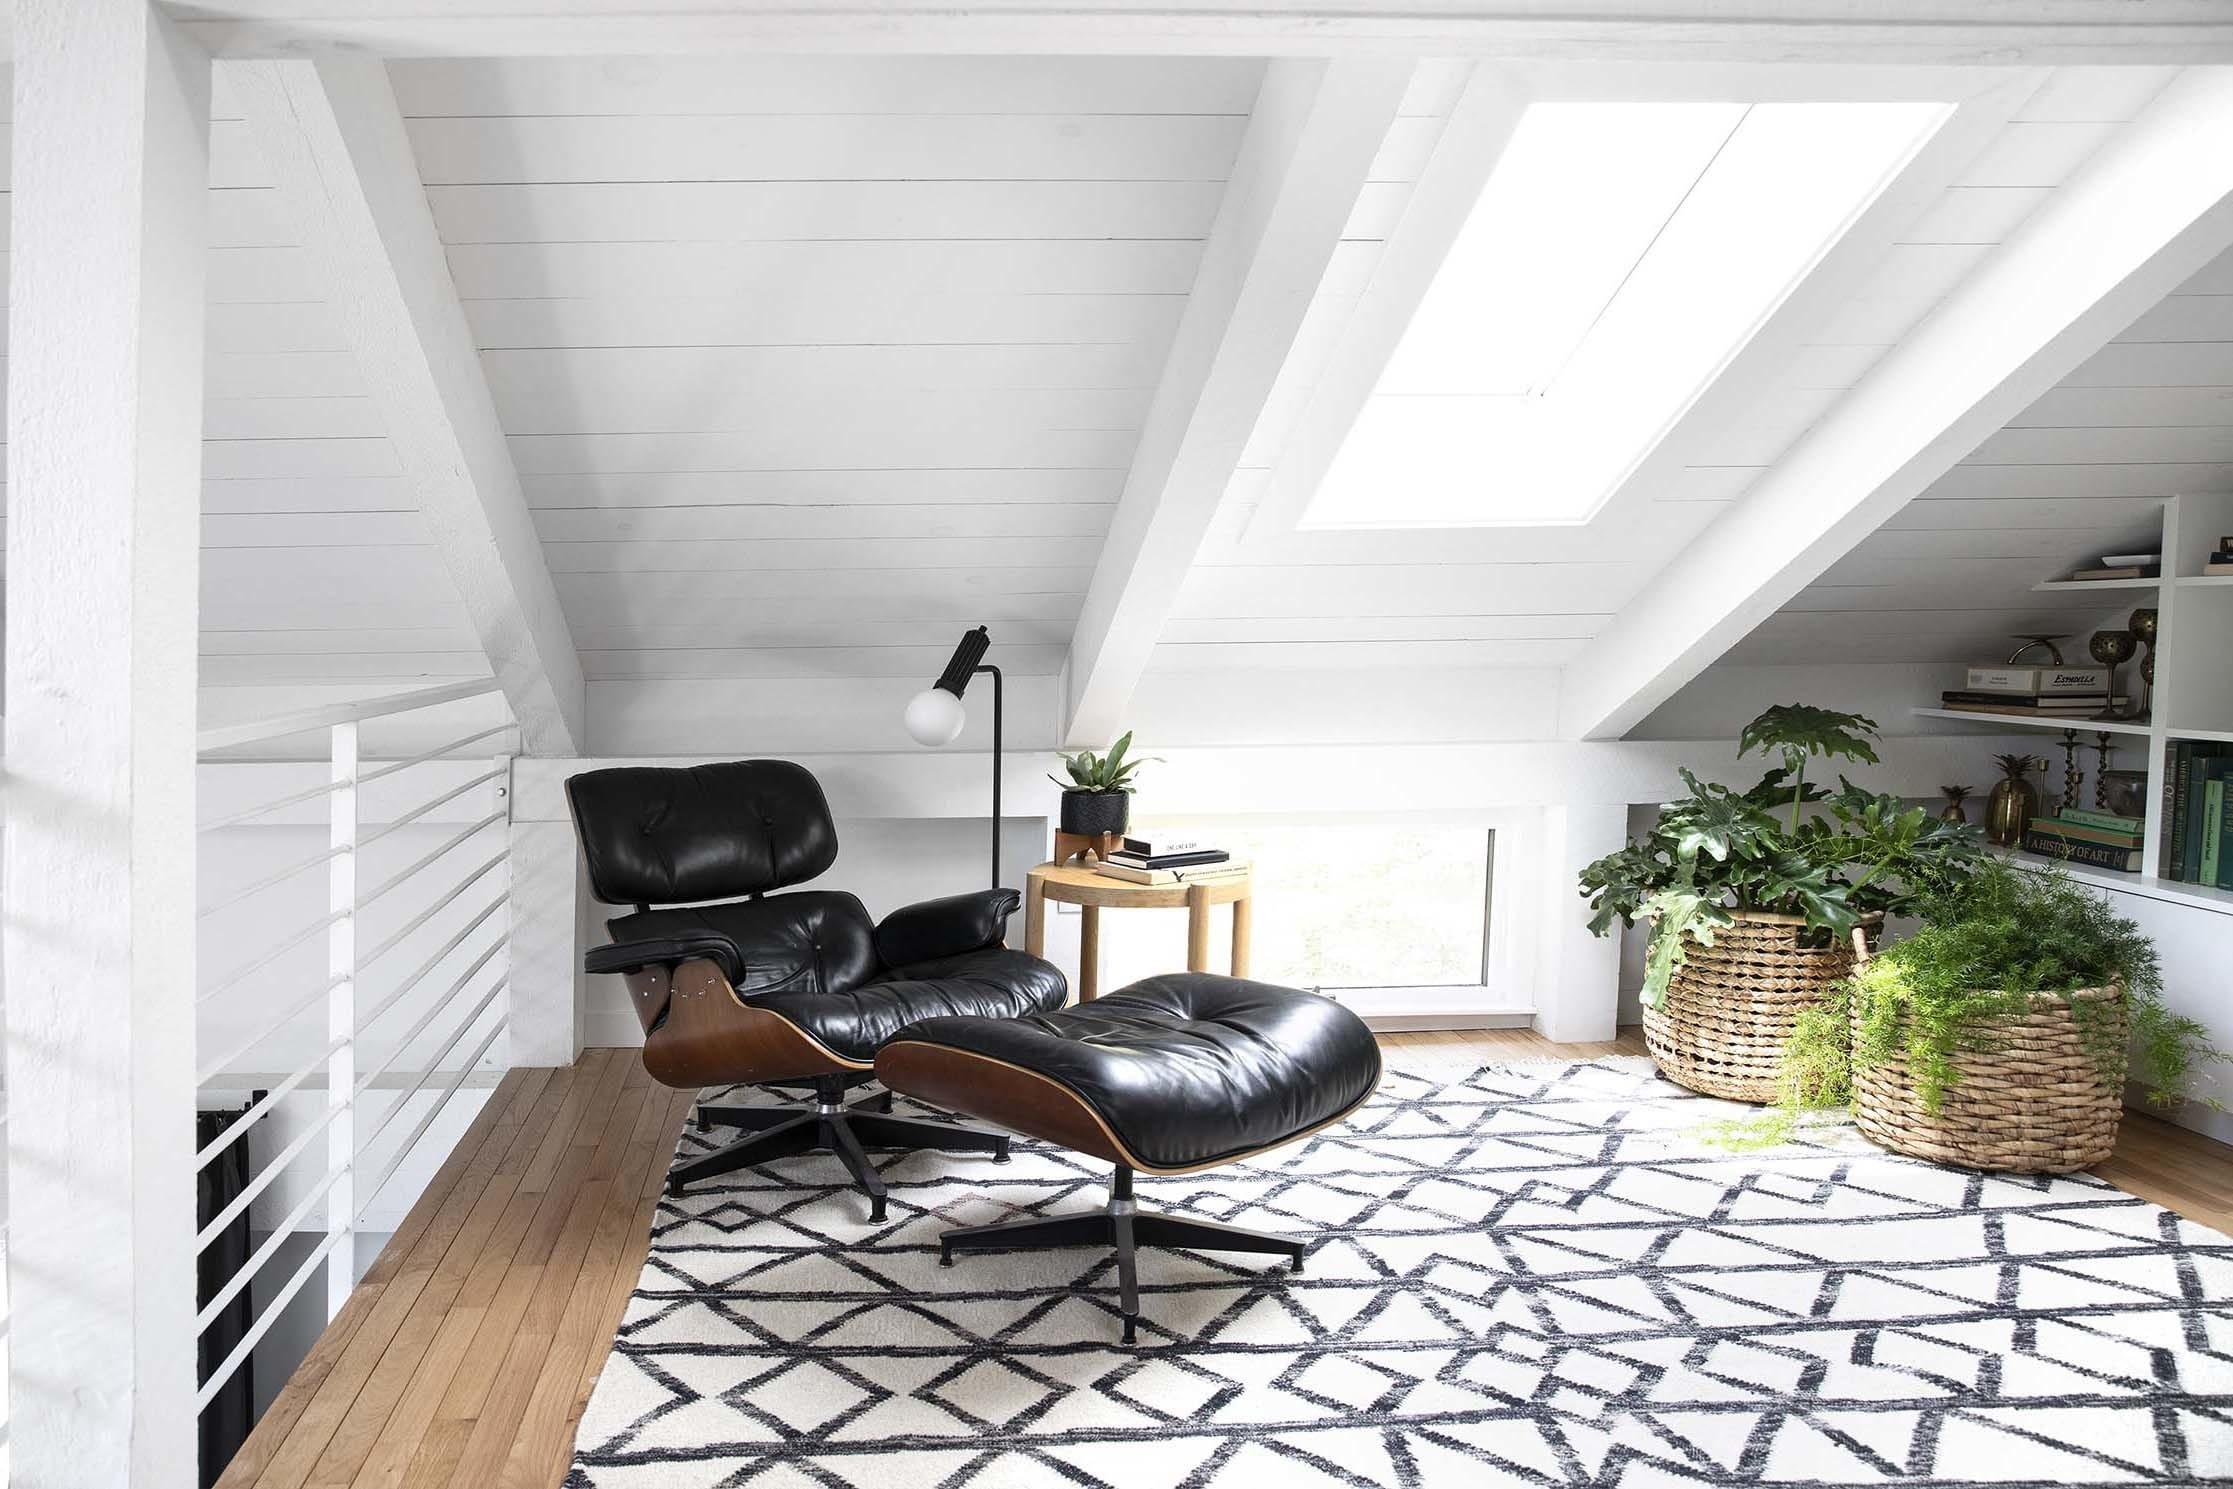 Eames chair under skylight tmb